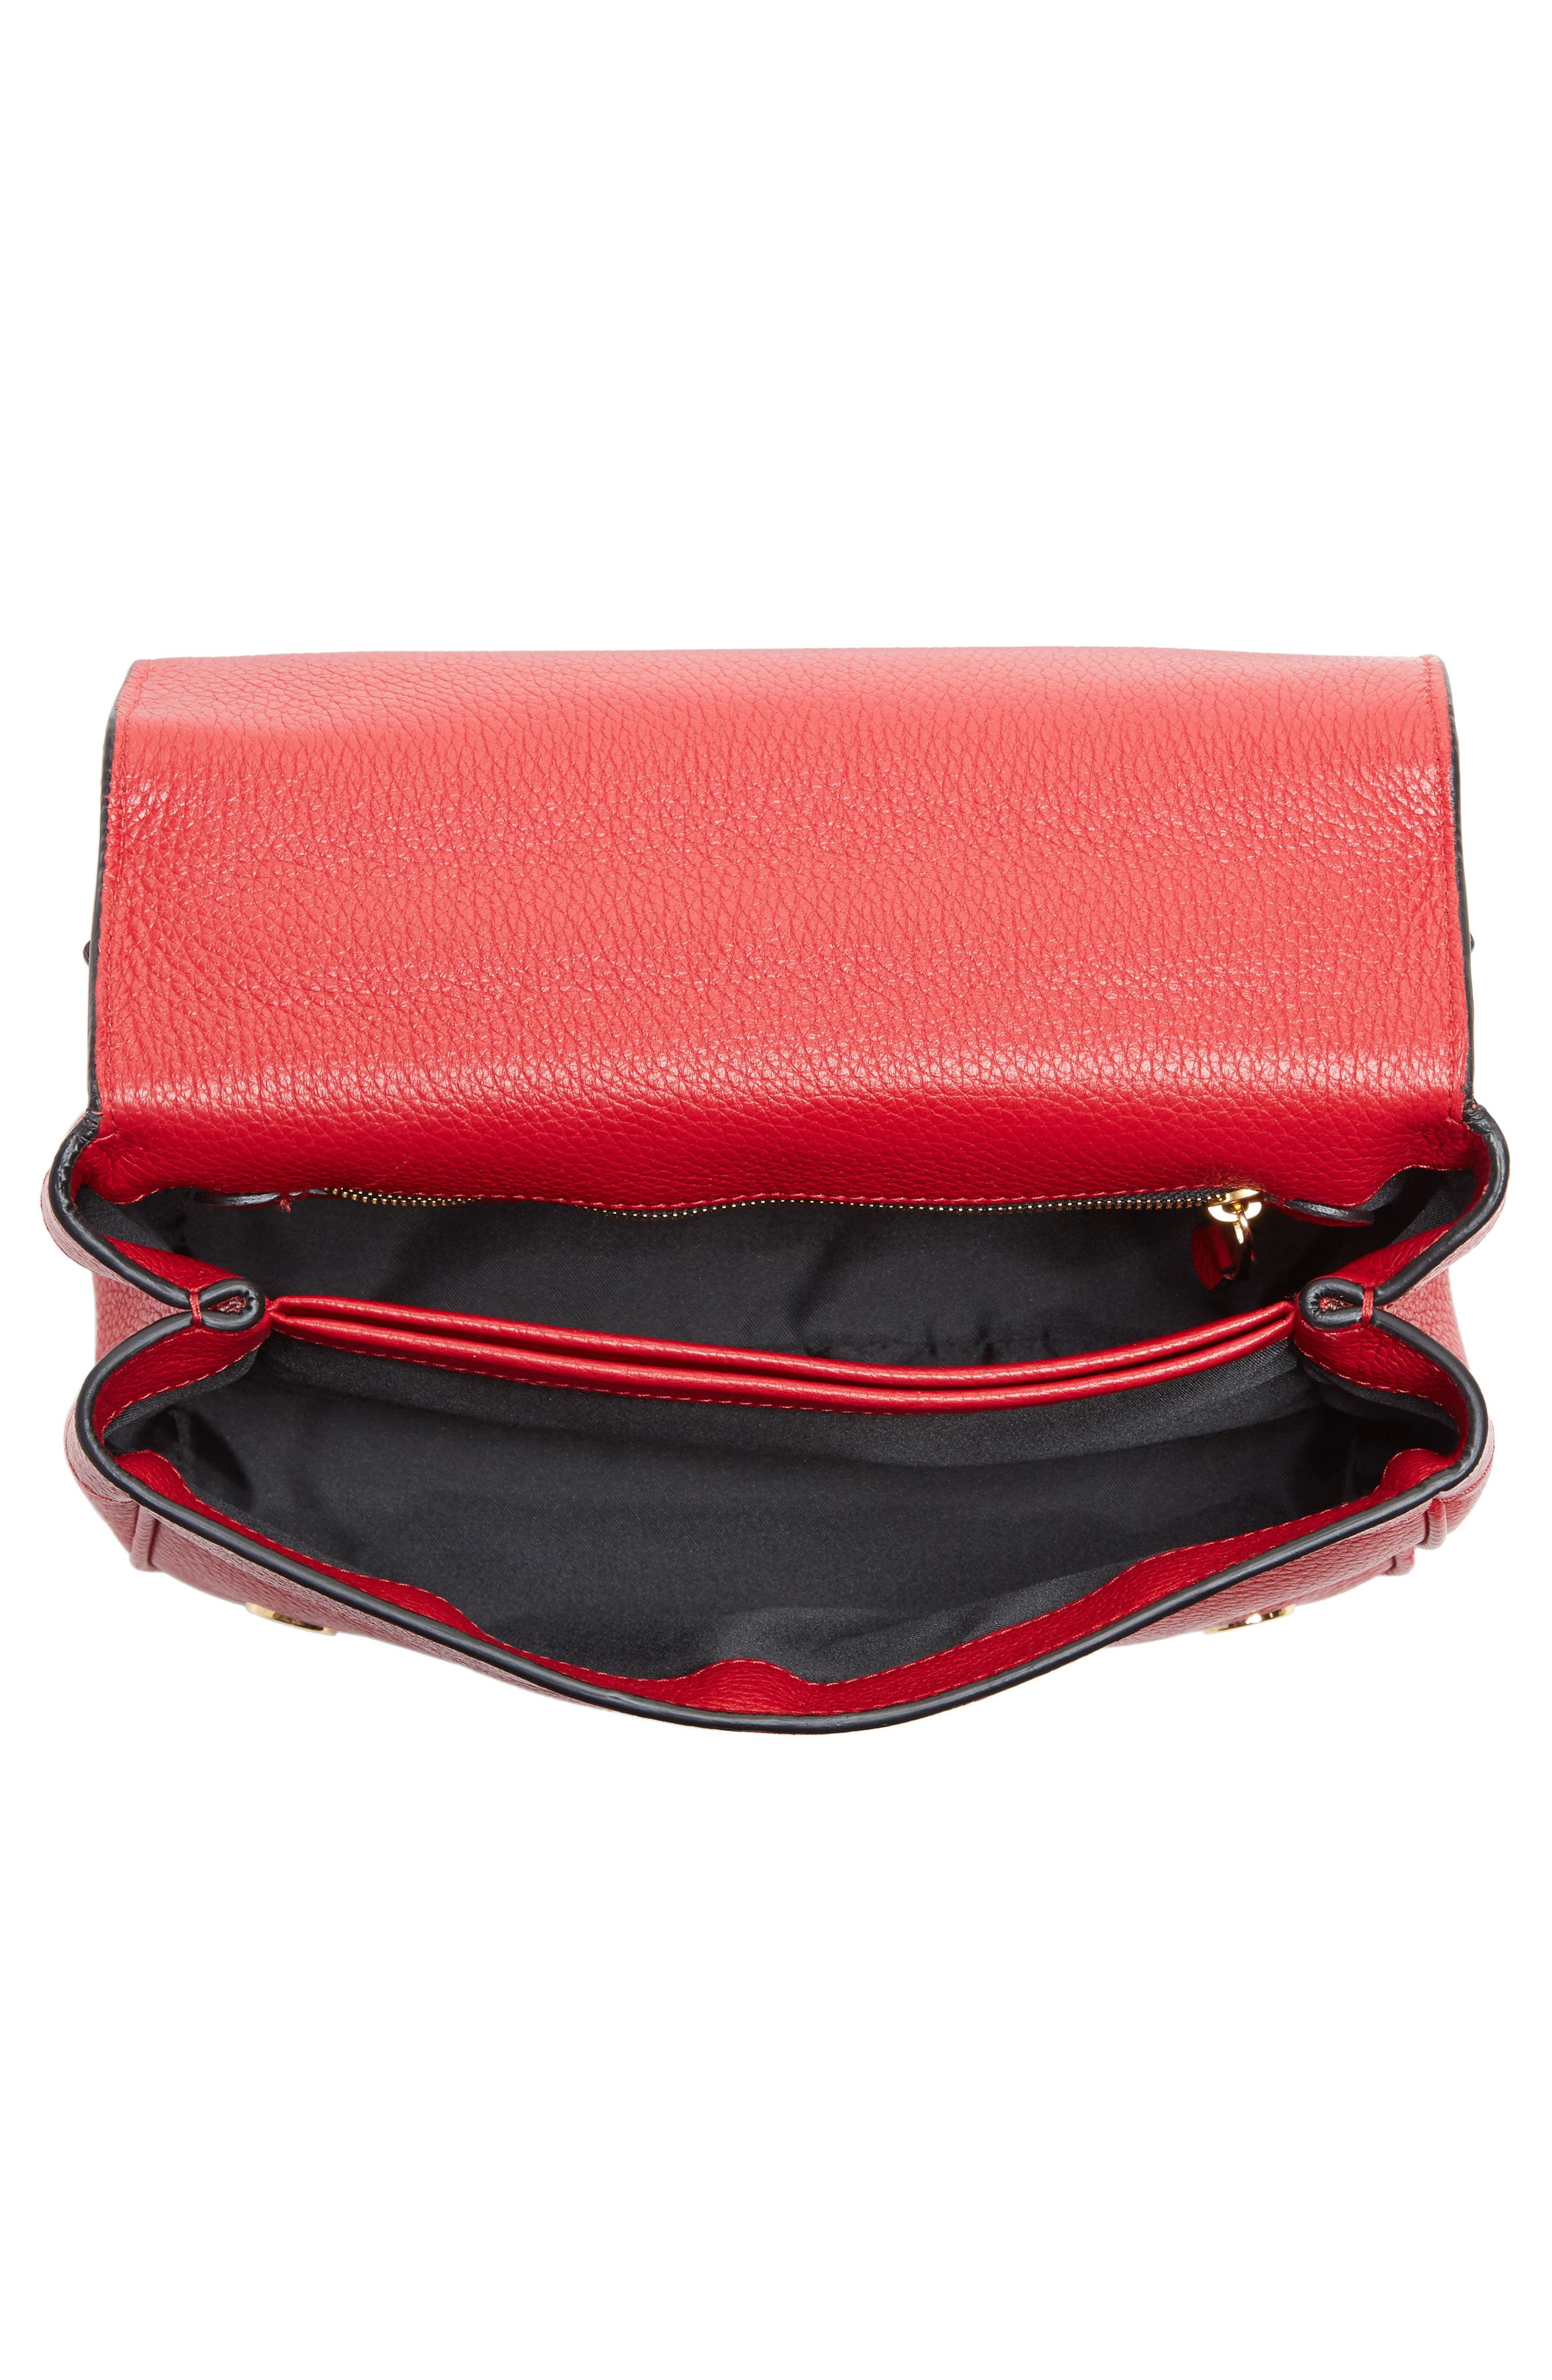 Grainy-B Leather Crossbody Bag,                             Alternate thumbnail 4, color,                             Red